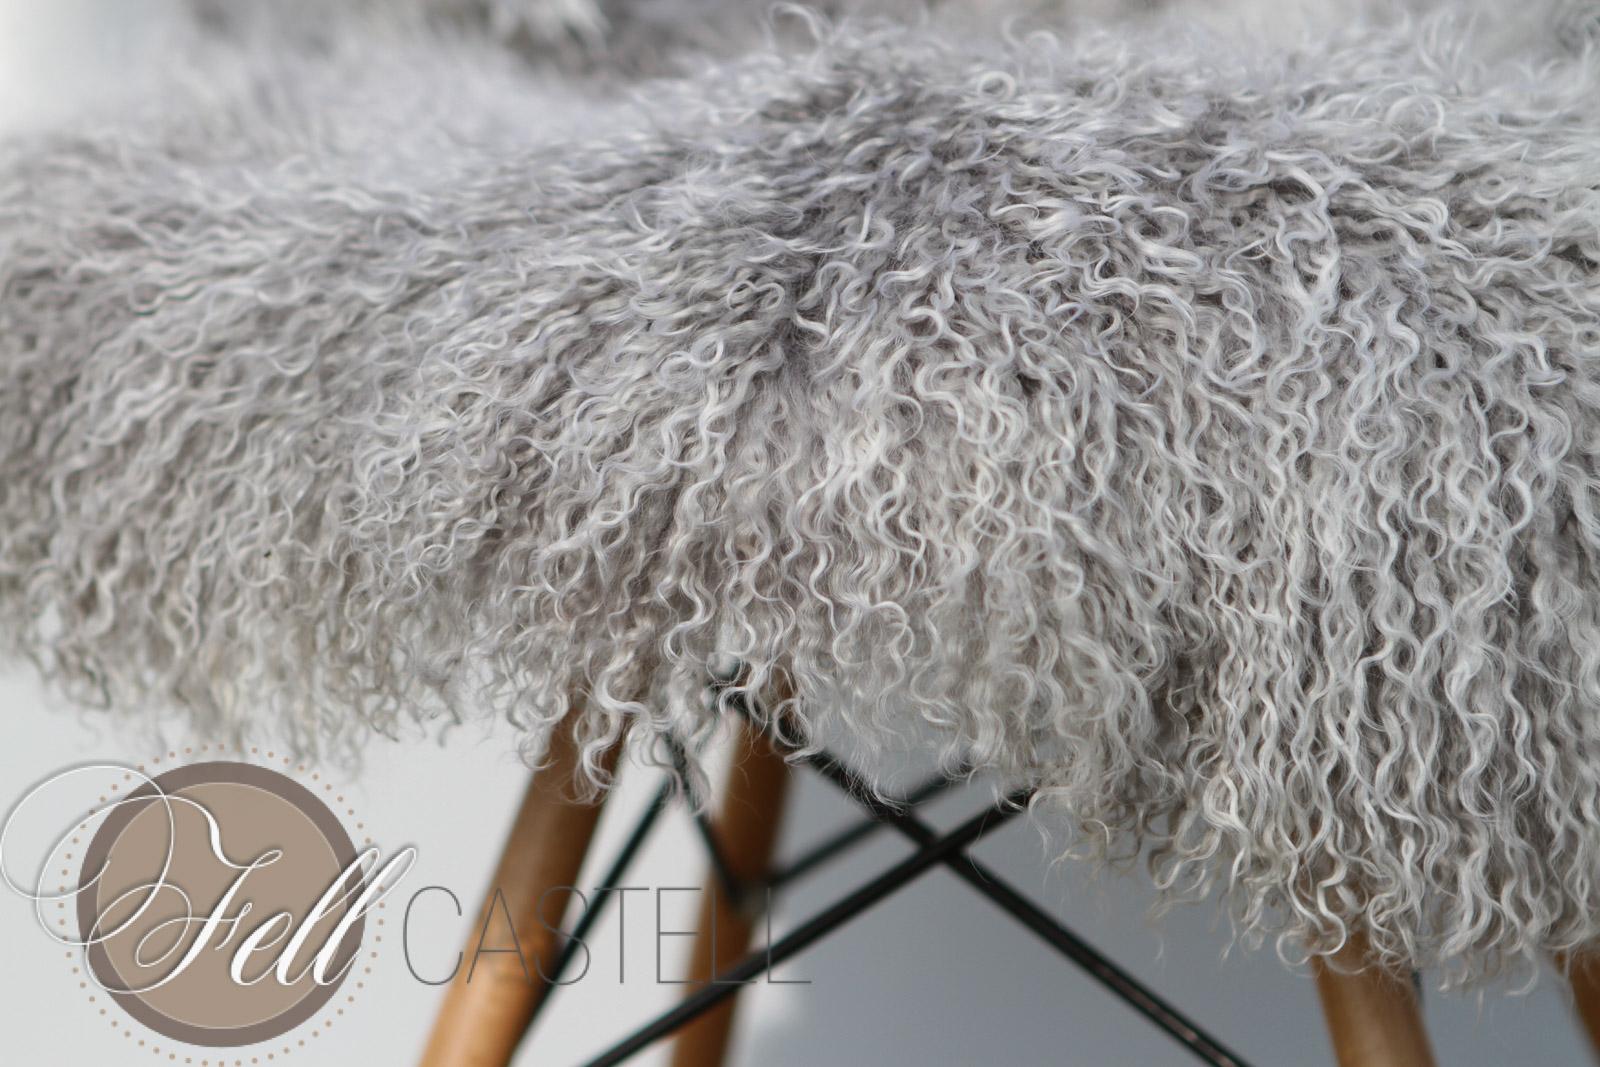 teppich tibet lammfell silbergrau decke tibetfell grau mit. Black Bedroom Furniture Sets. Home Design Ideas